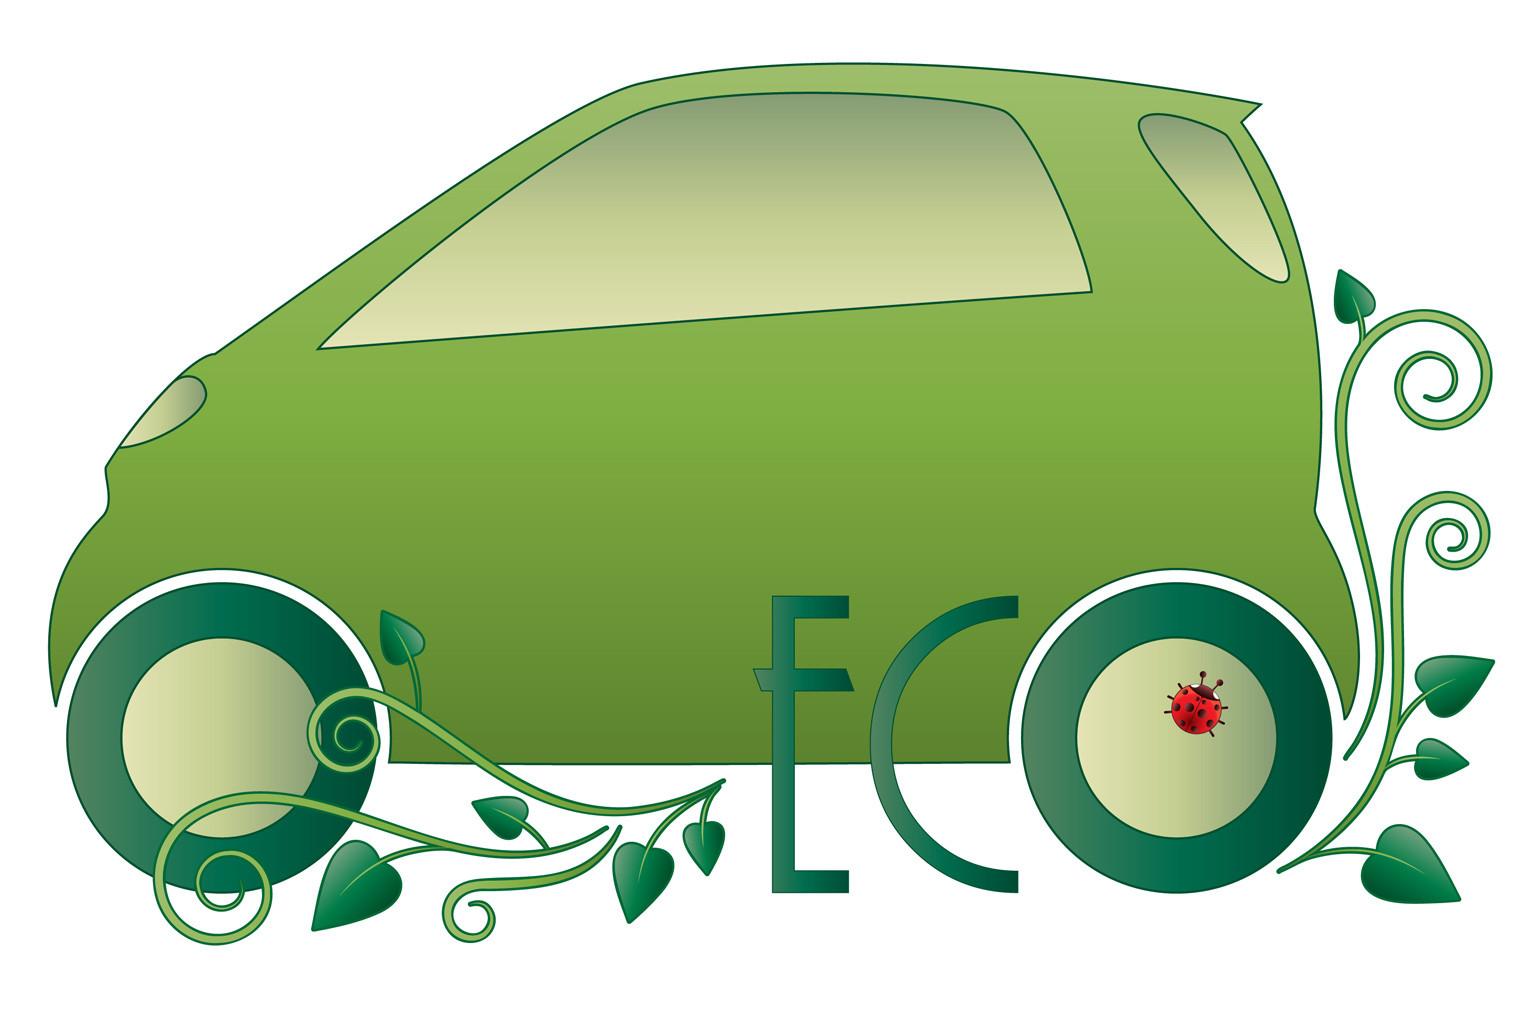 imm-auto-verde-ecologica-02